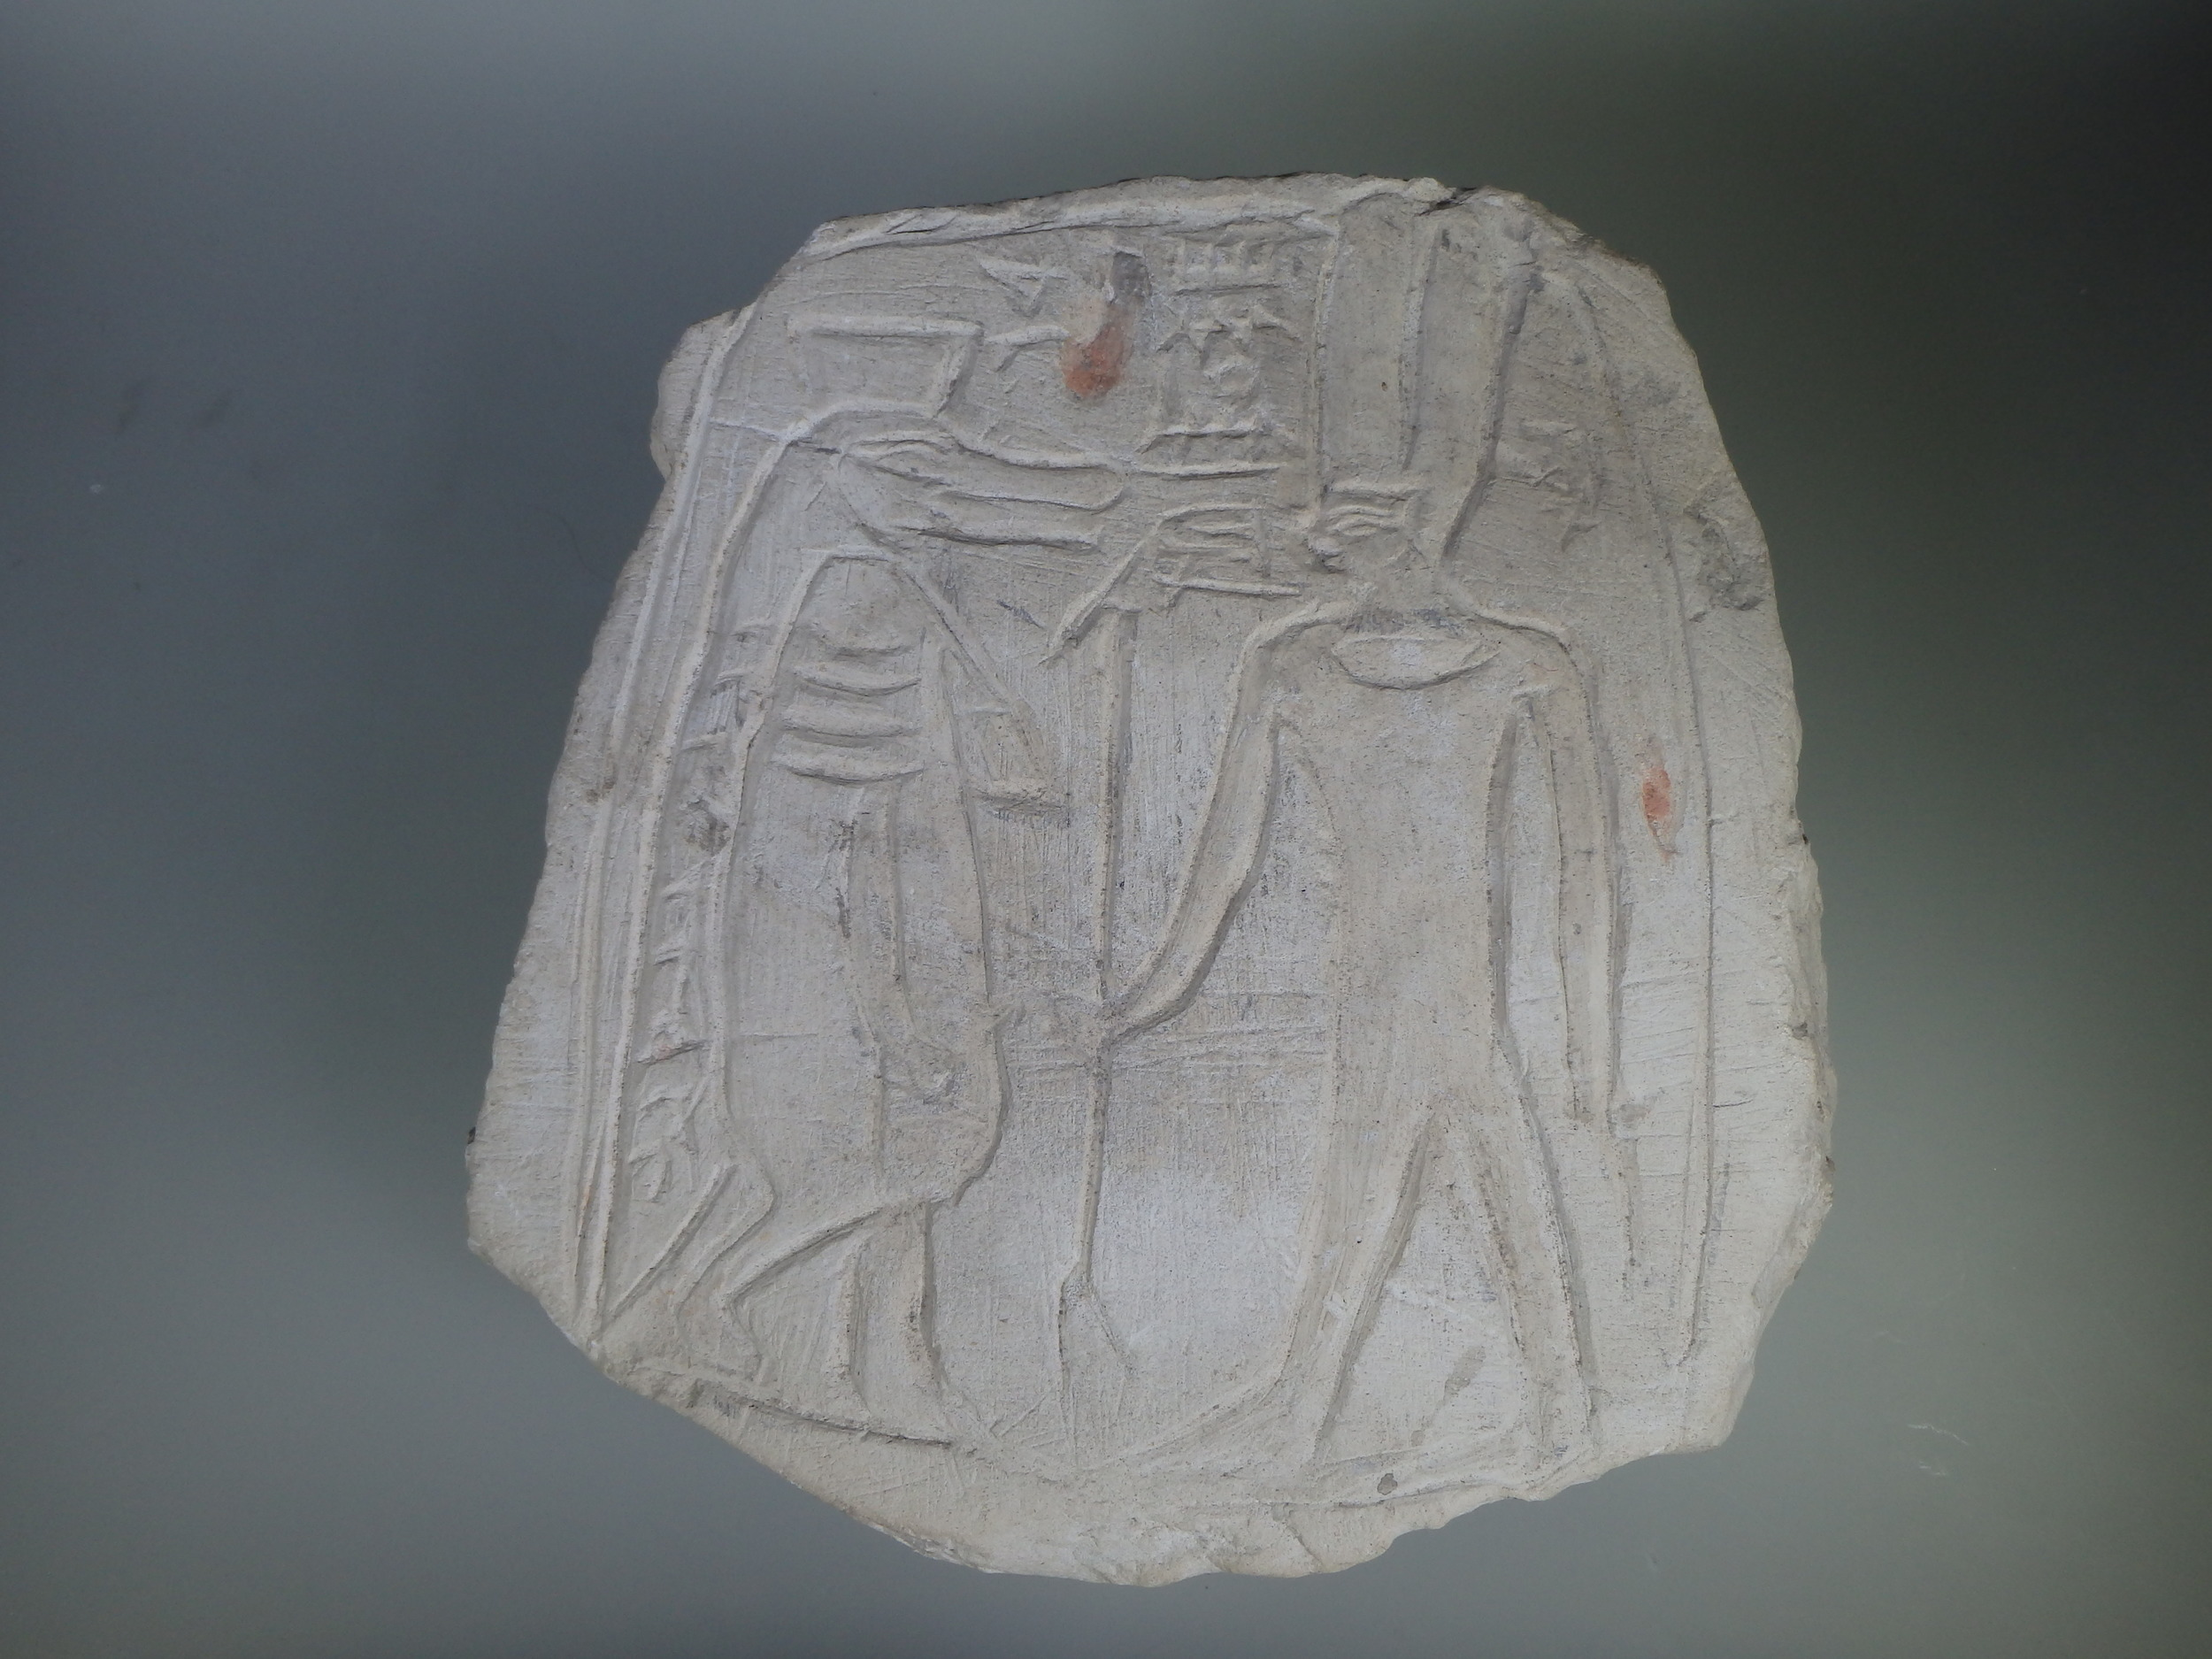 Figure 10: A limestone votive stela depicting the goddess Tawaret and the god Amun-Re. New Kingdom (1539-1075 BCE). University of Pennsylvania Museum 69-29-65.